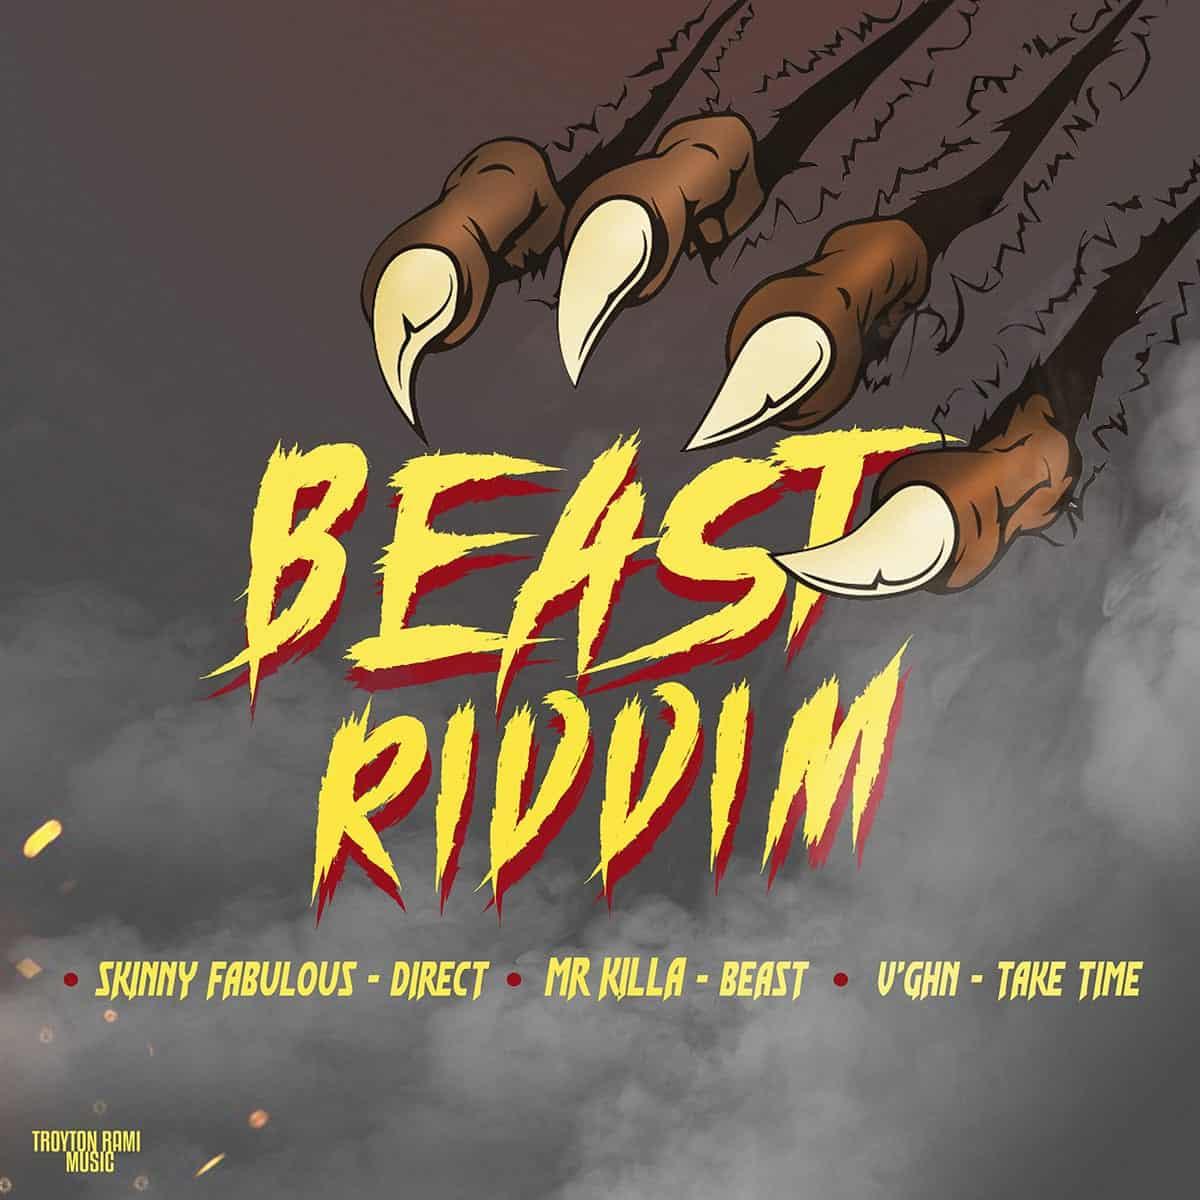 Beast Riddim Feat. Mr Killa, Skinny Fabulous, V